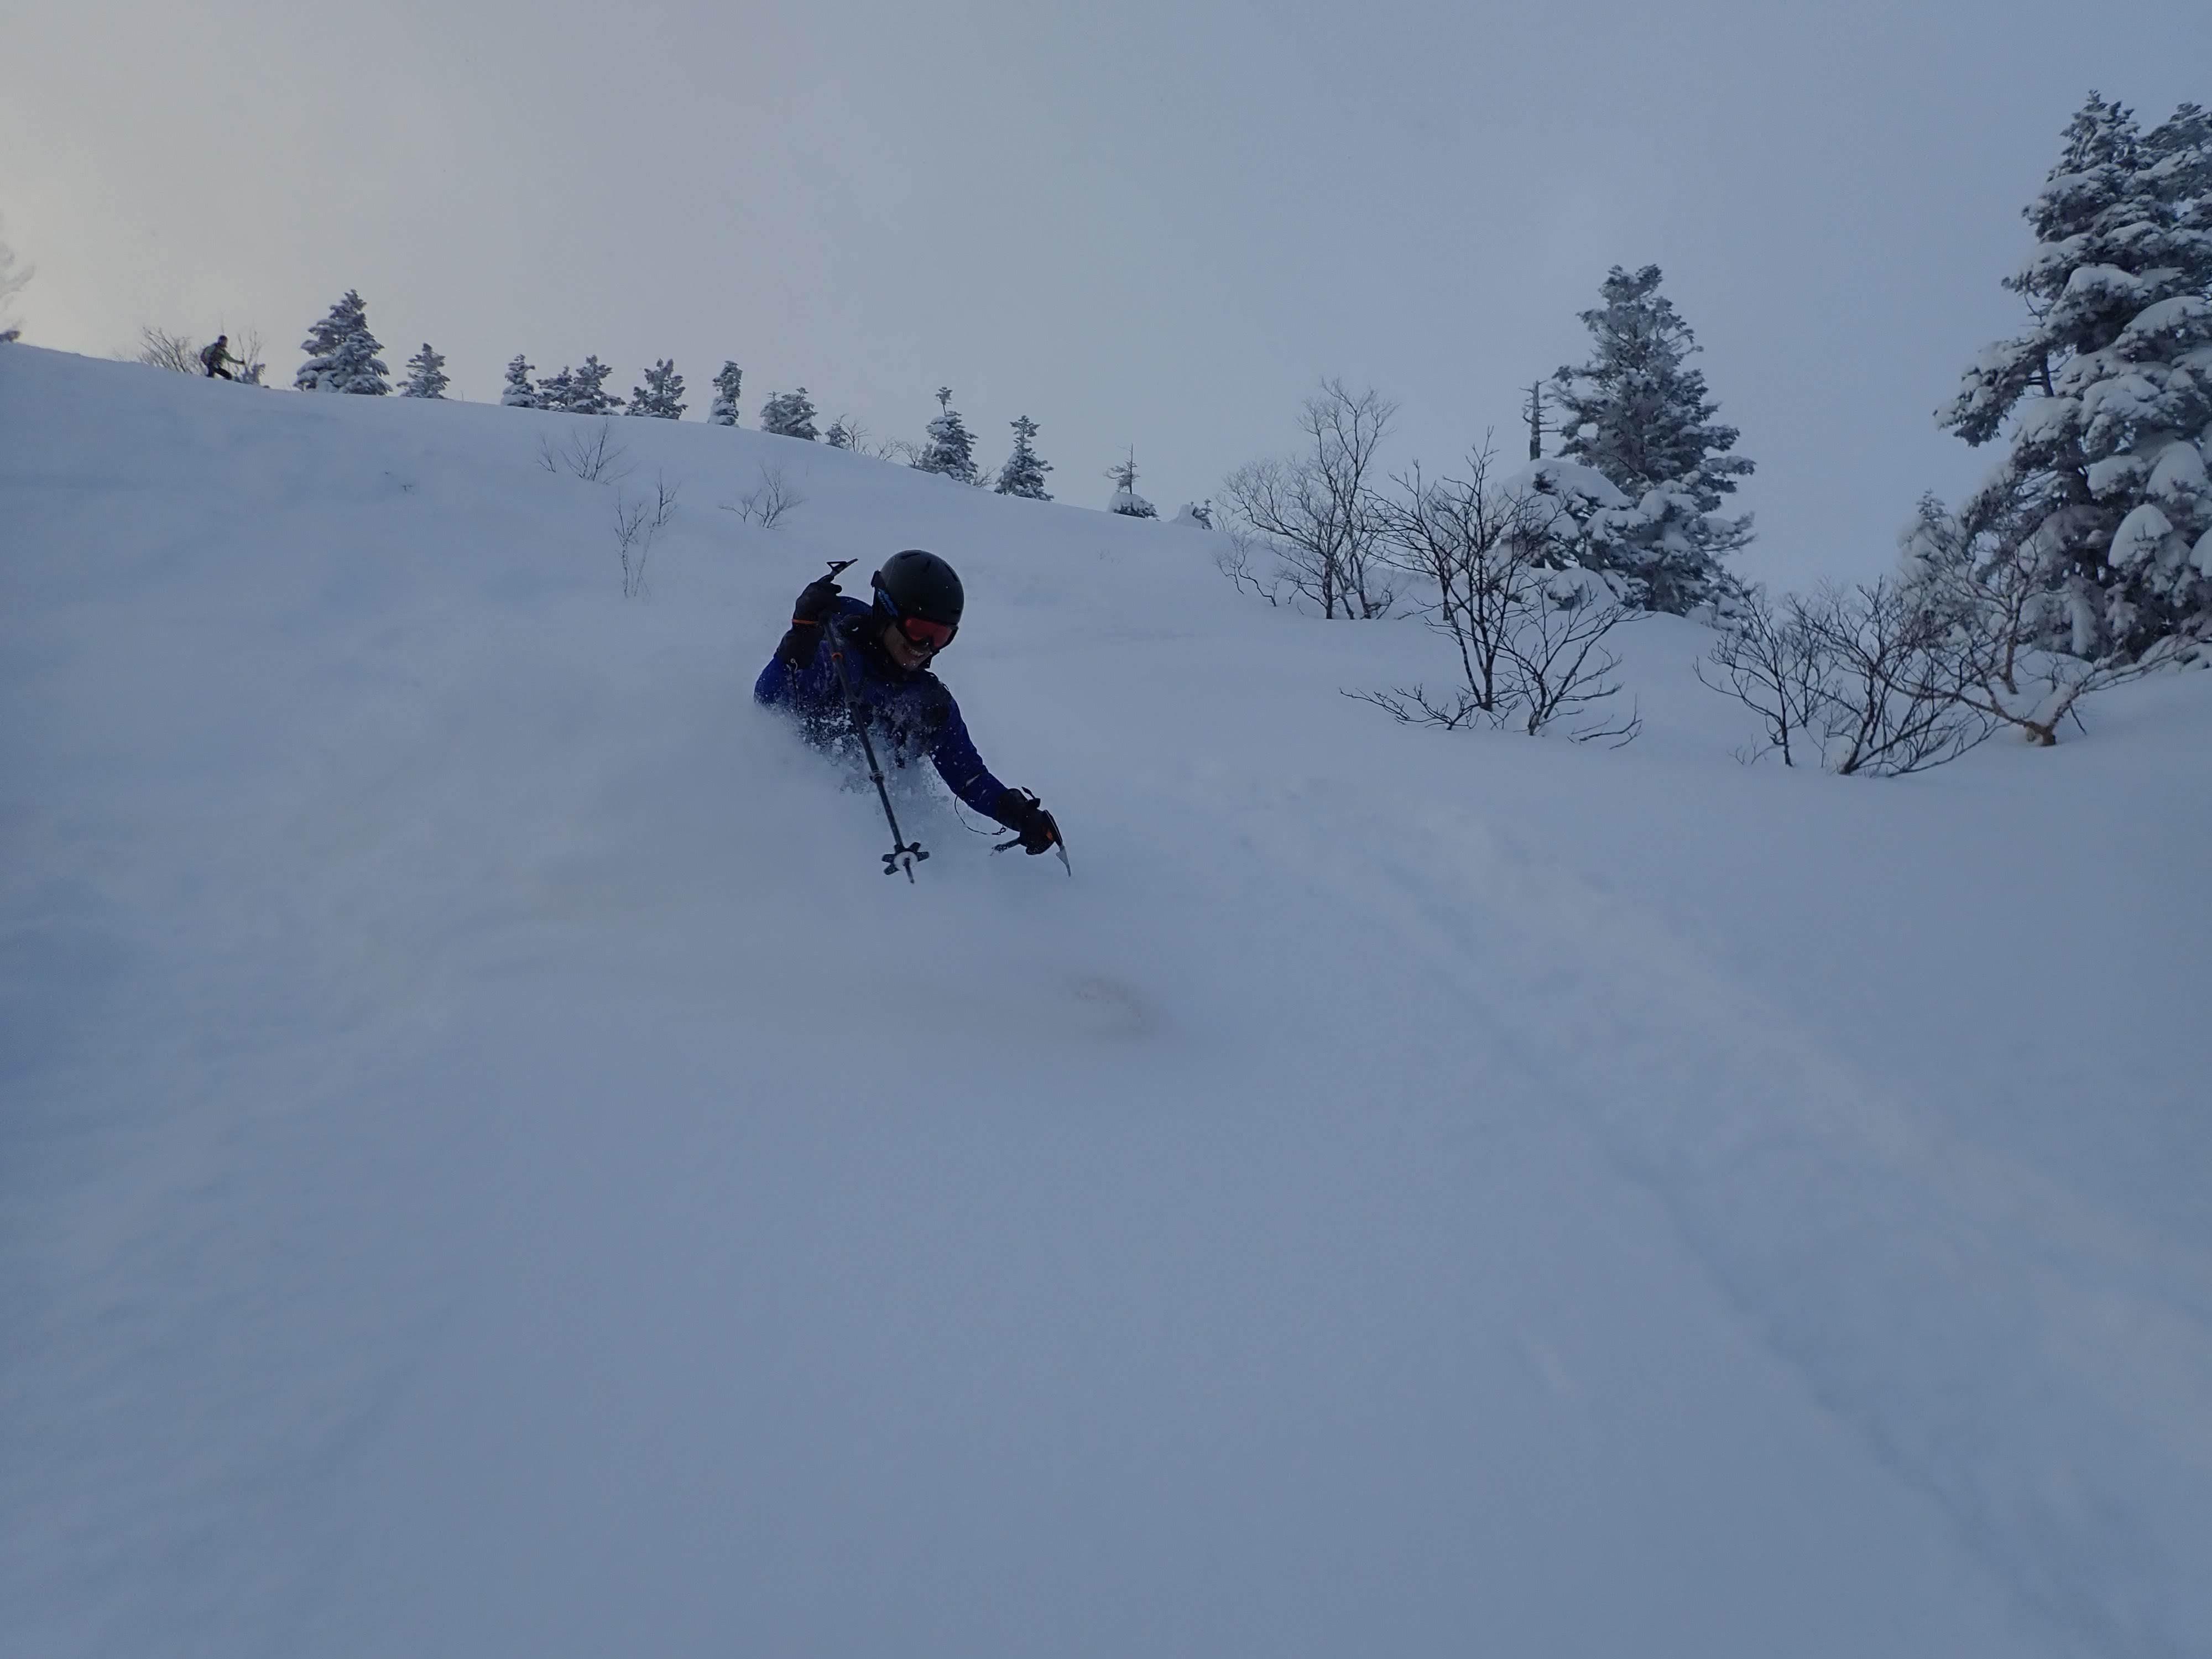 後生掛温泉スキーツアー(1日目)国見台 ~ 2019年12月28日_f0170180_23443000.jpg